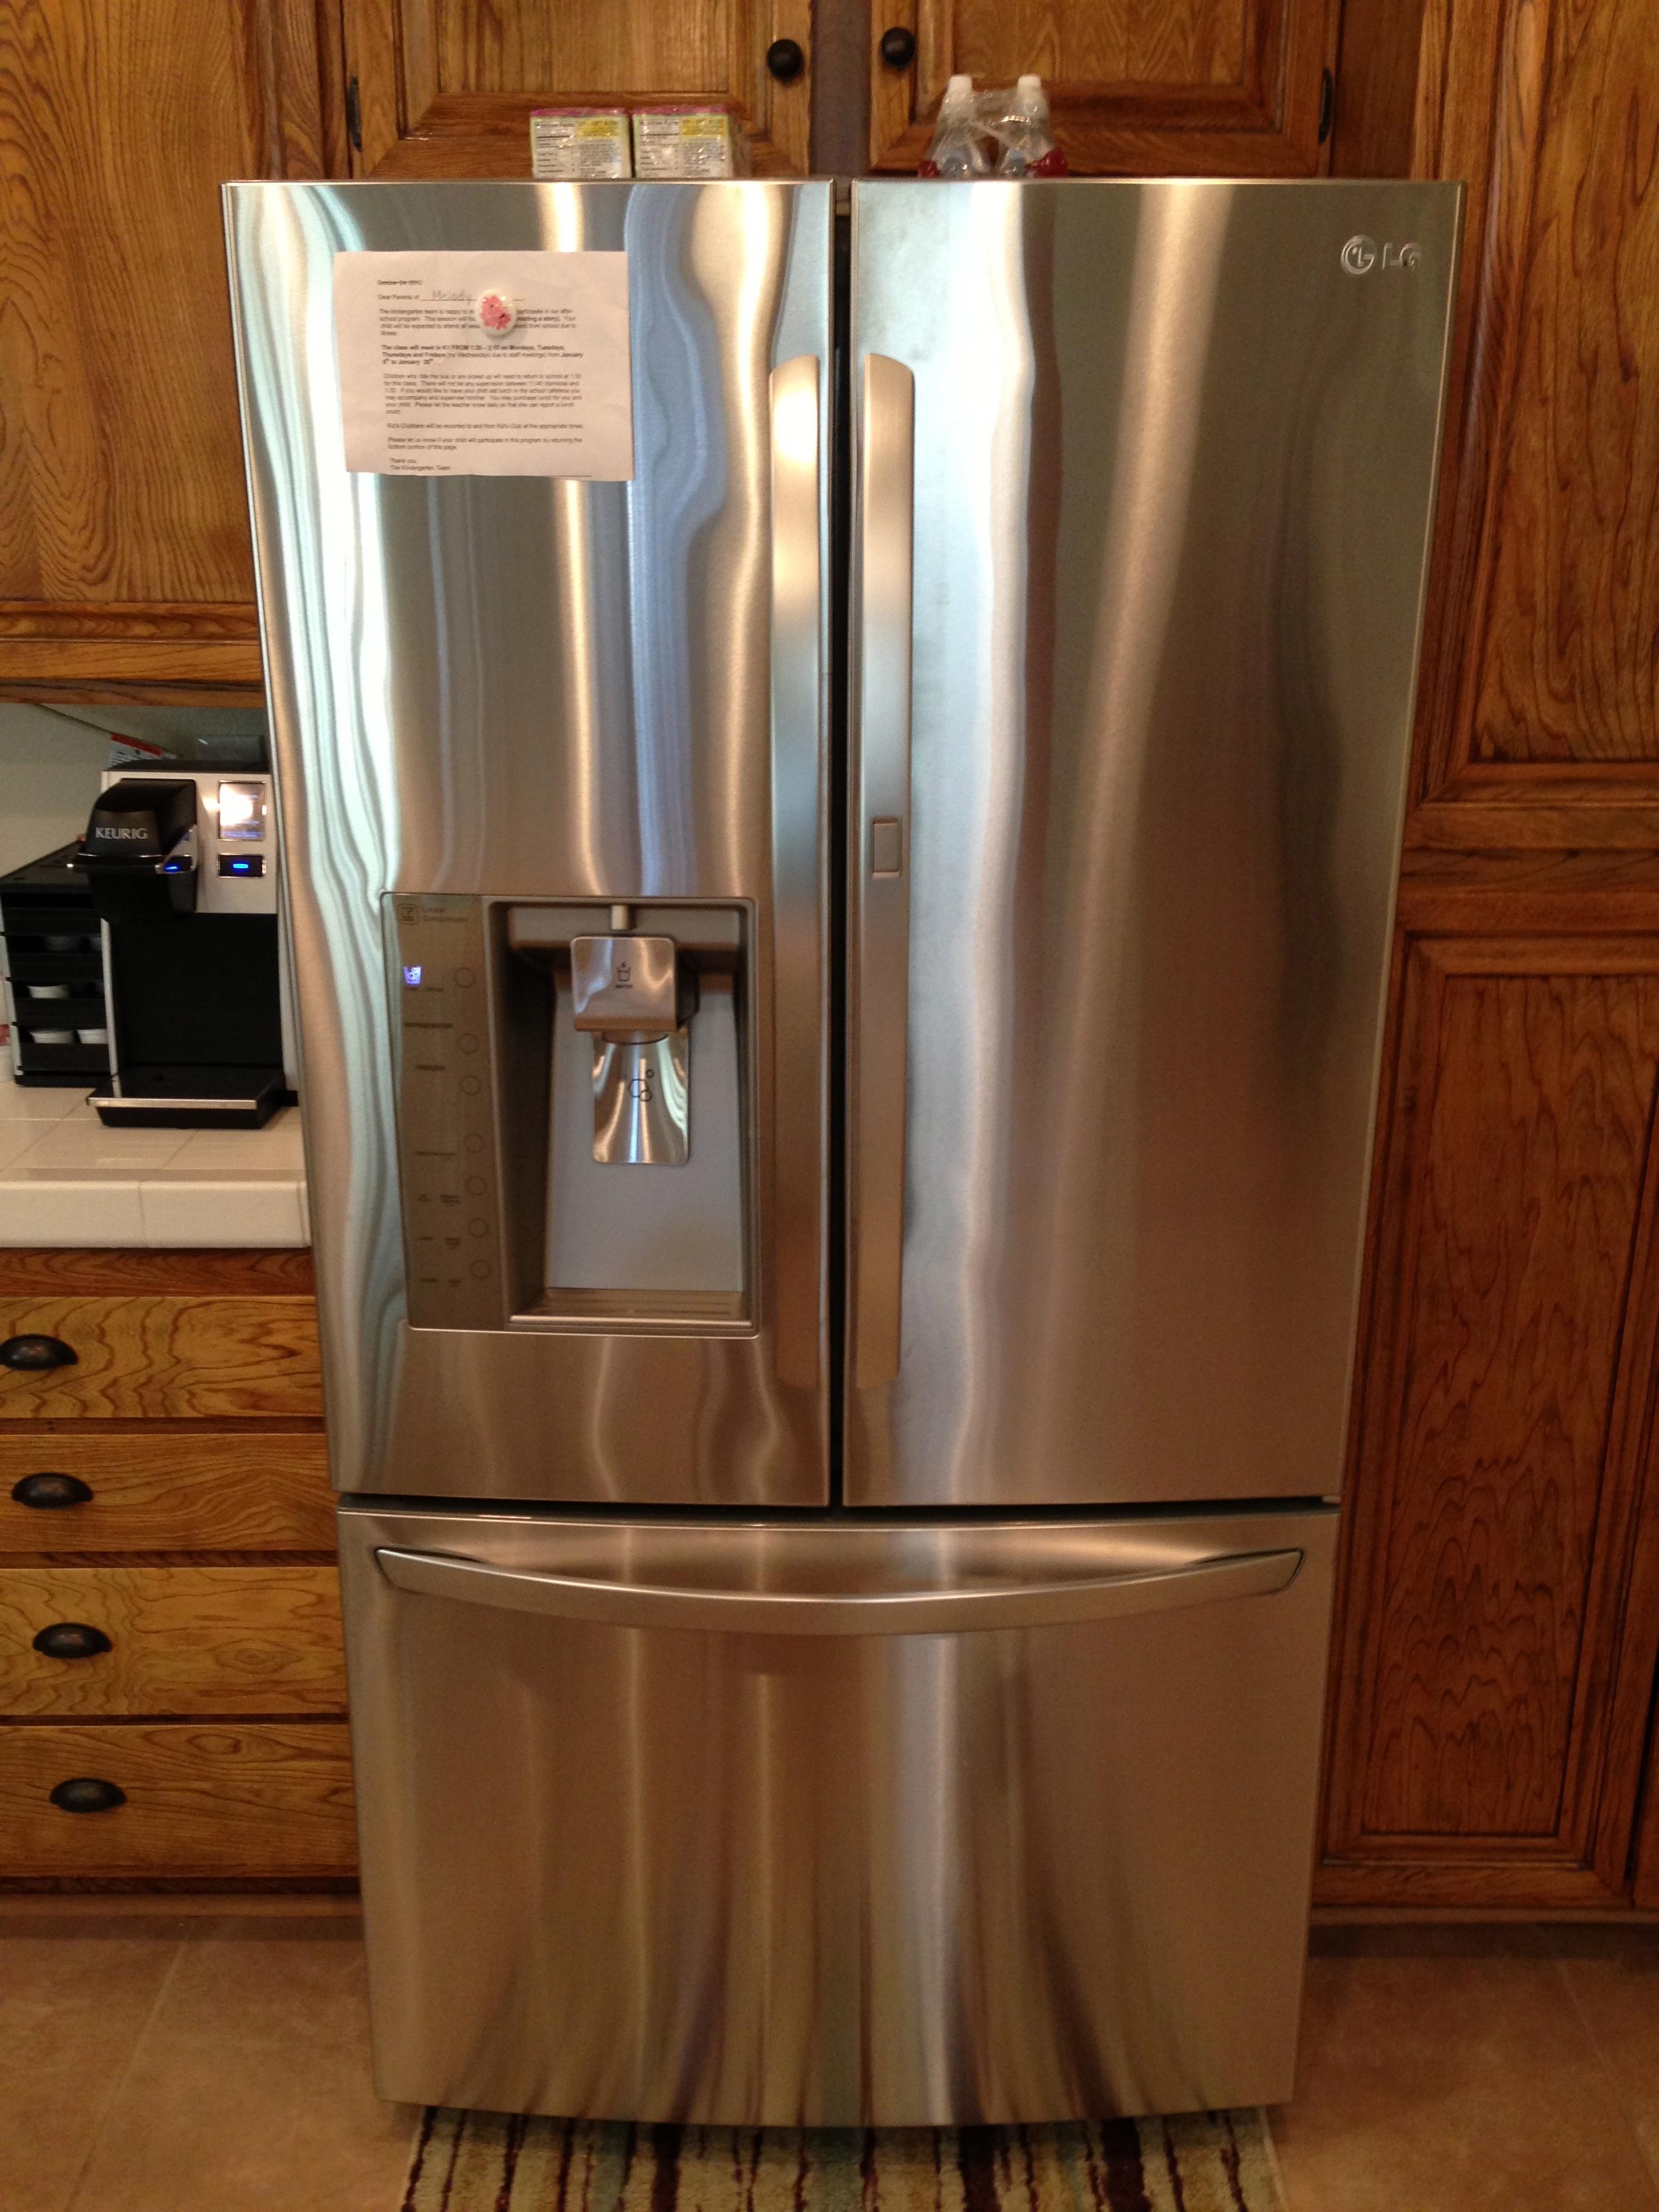 Home depot lg refrigerator